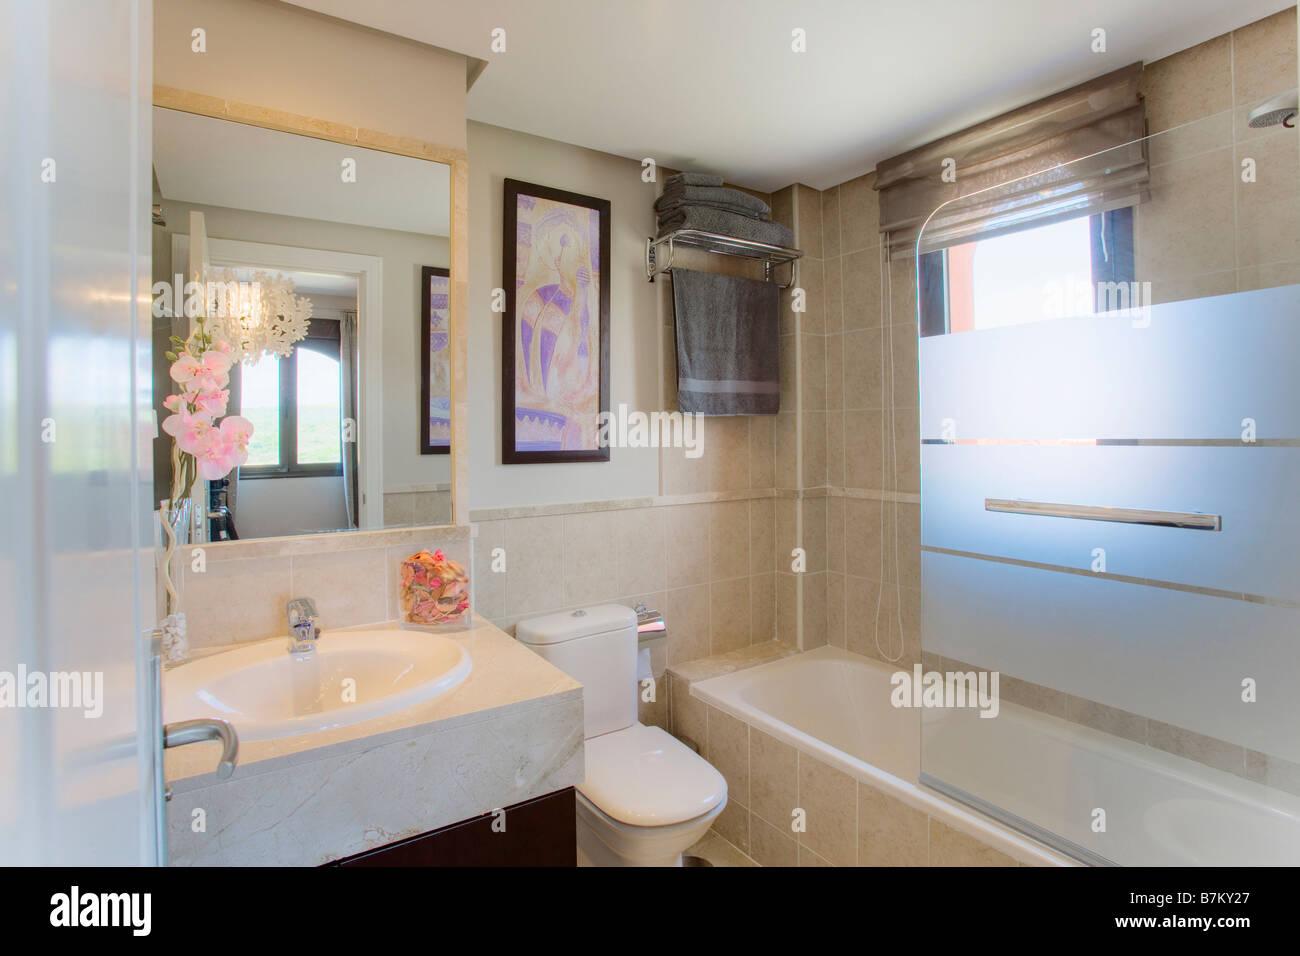 Vasca Da Bagno Opaca : Vasca da bagno miscelatore rubinetto vetro nero opaco nero